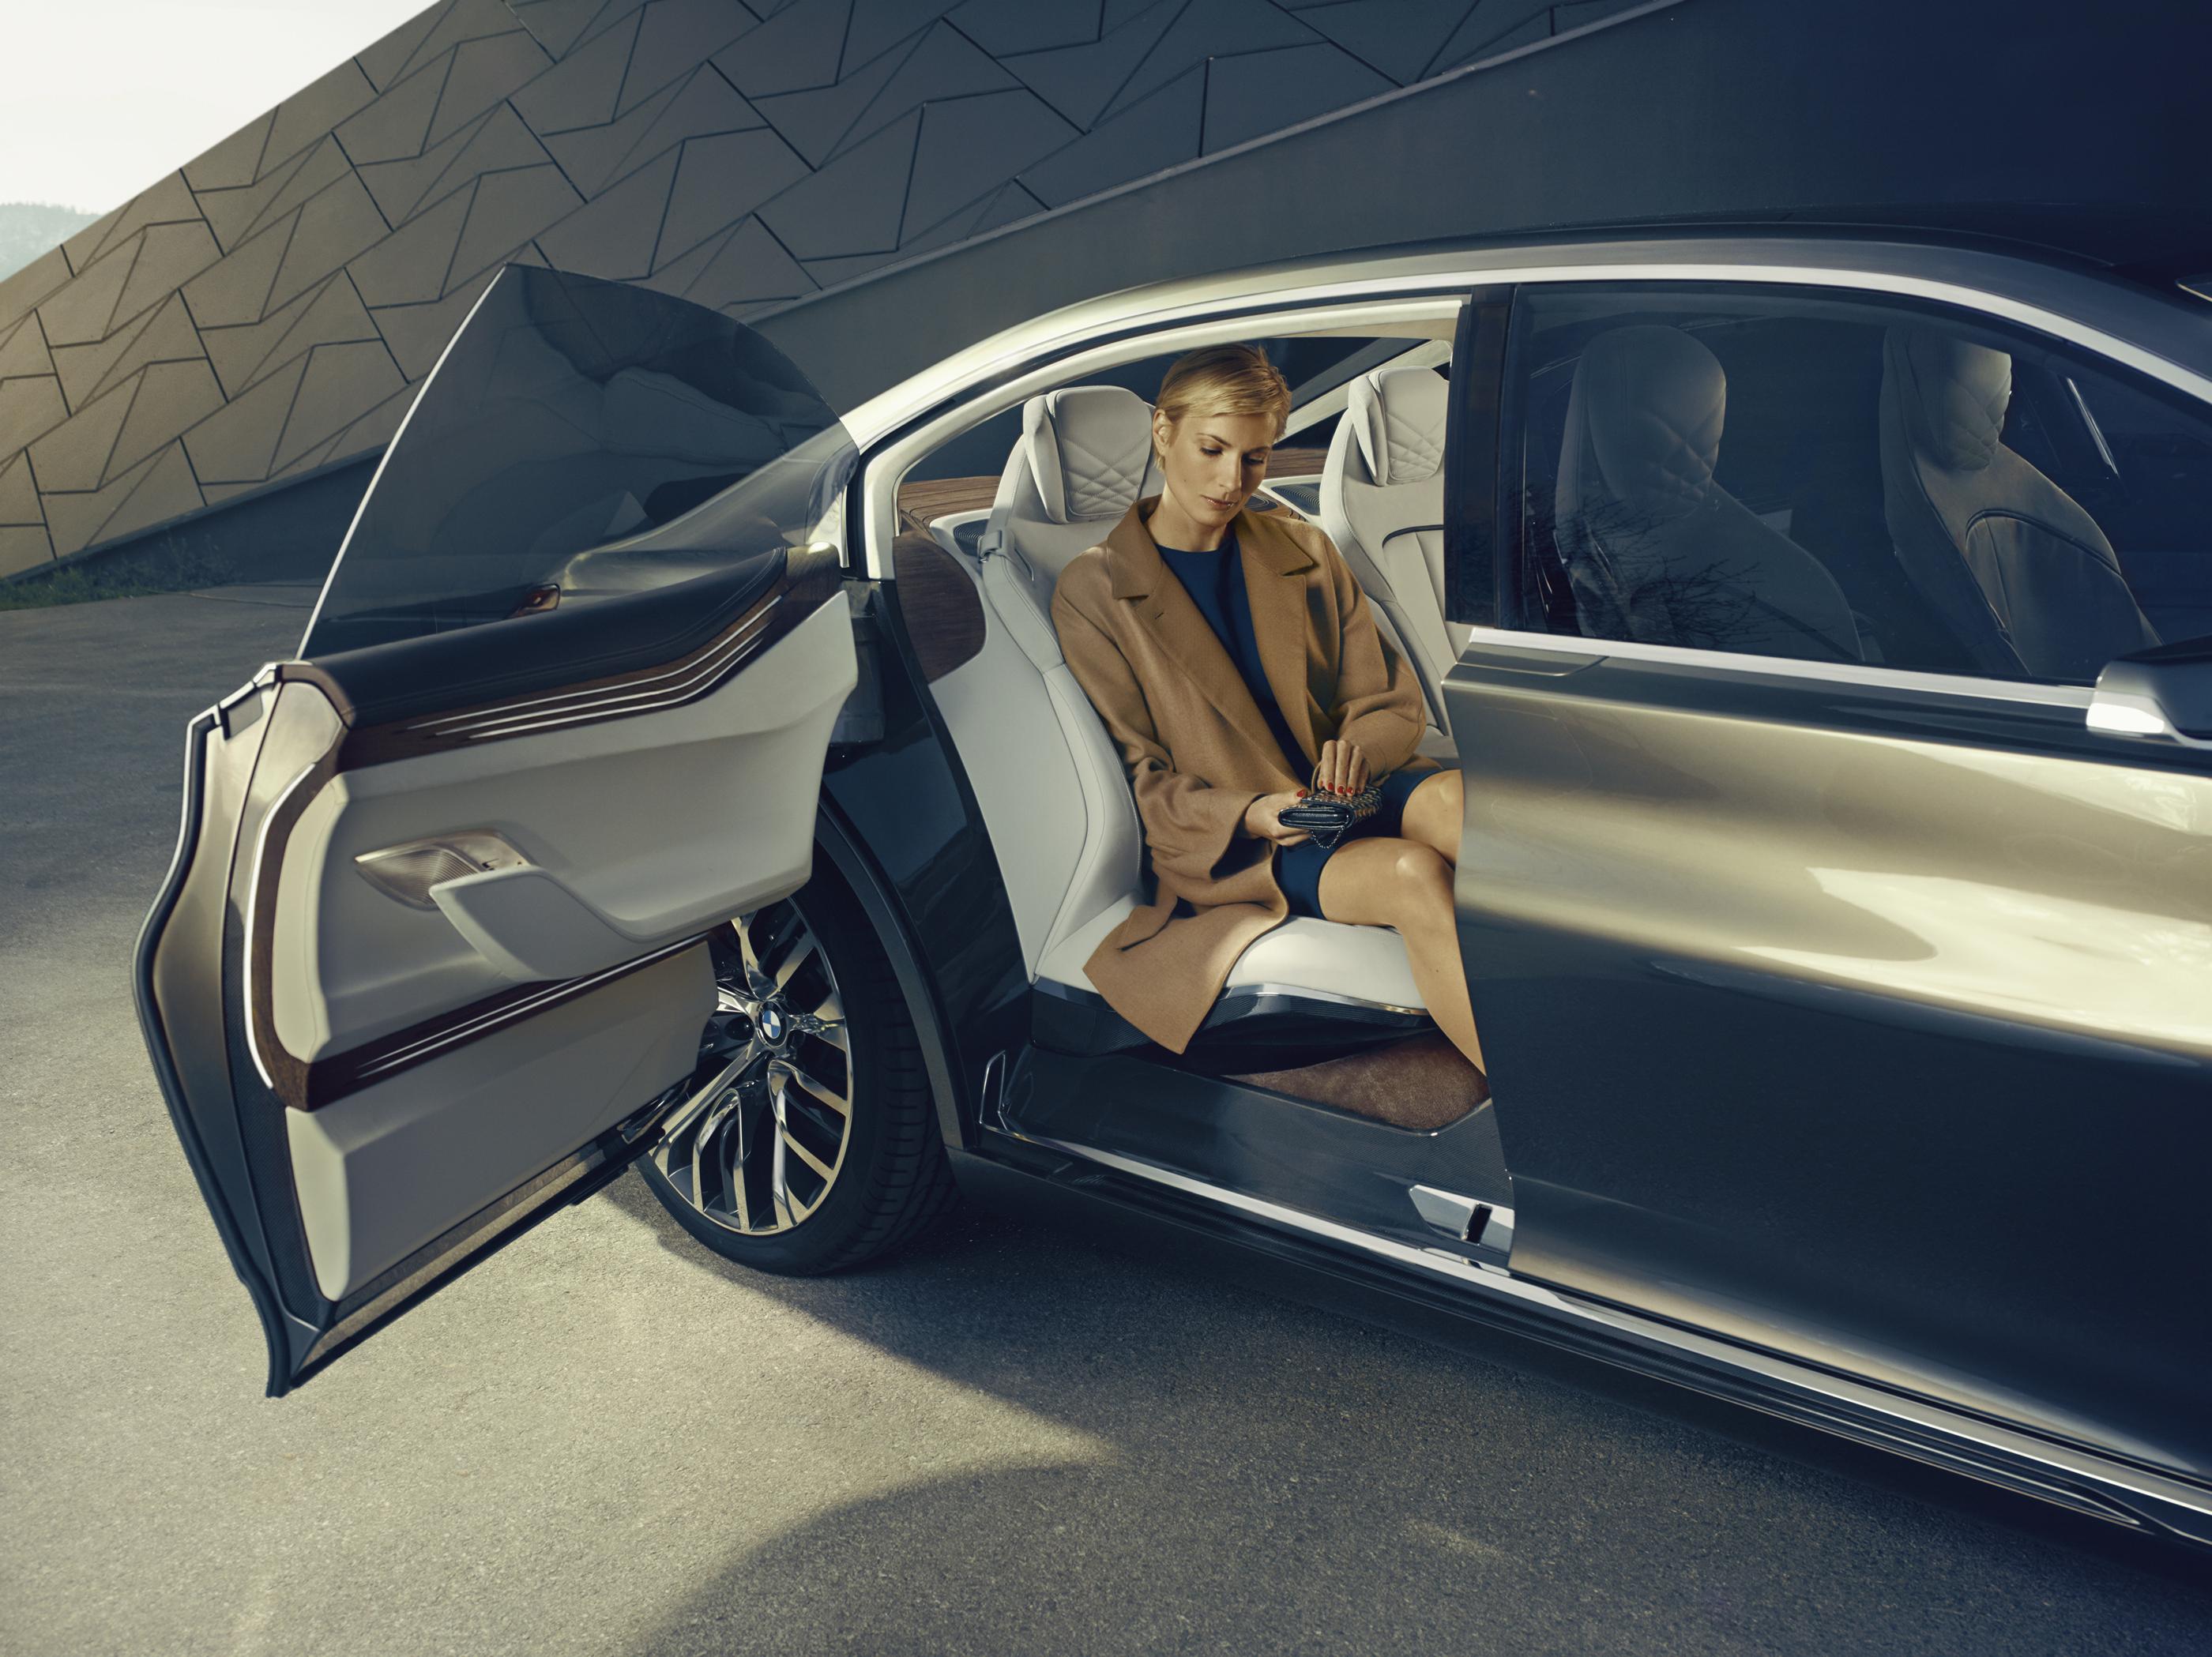 Bmw Vision Future Luxury 2014 Beijing Auto Show Designapplause